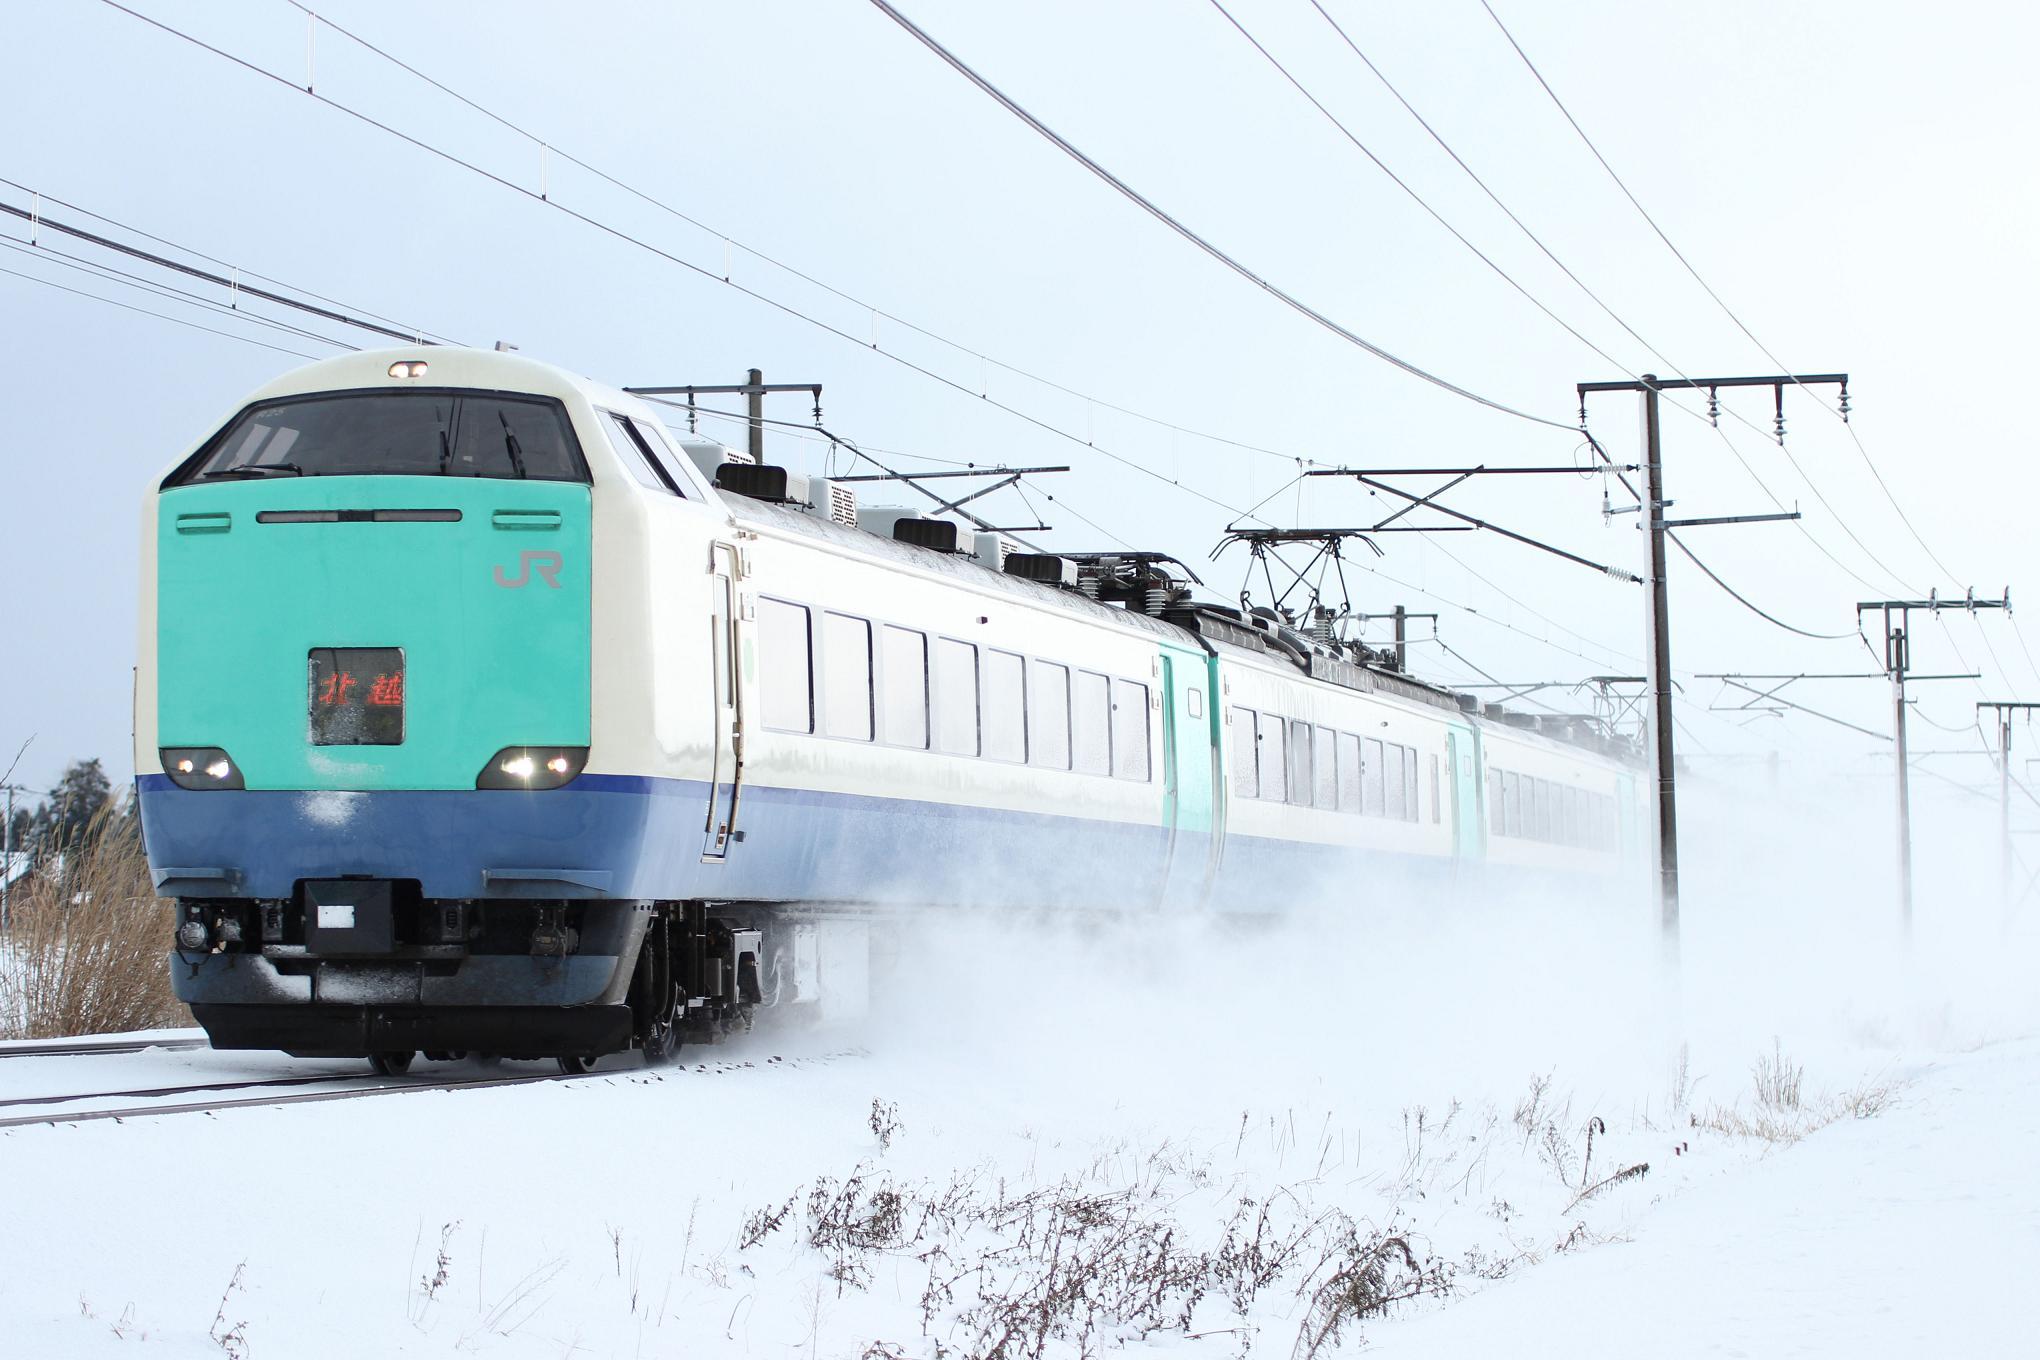 Fw:の鉄道日誌 12月28日:くびき...